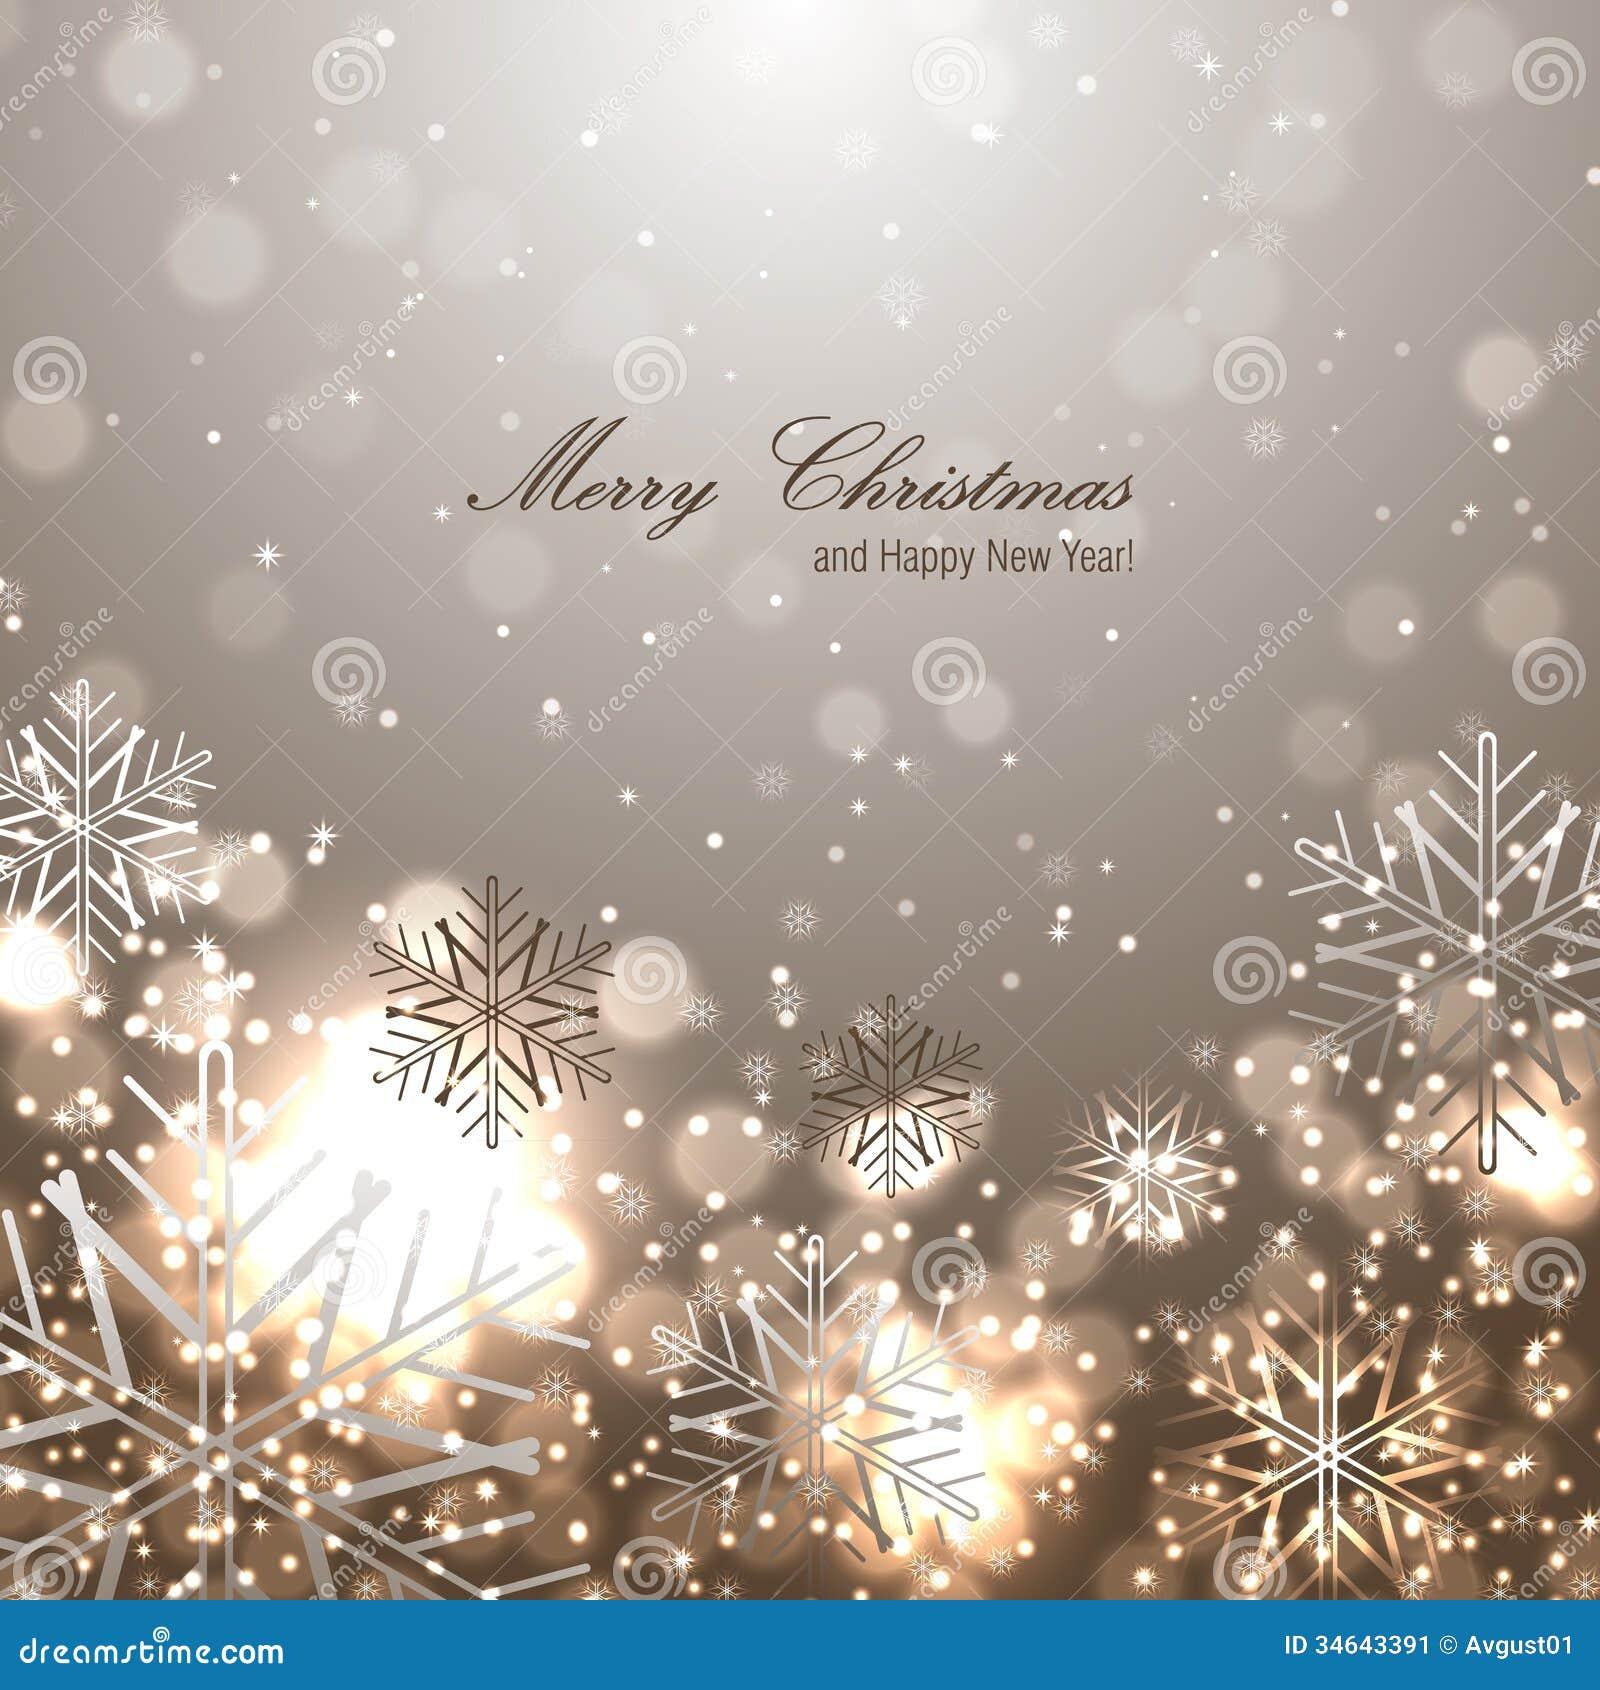 Beautiful Christmas Background Images.Beautiful Christmas Background With Snowflakes Stock Vector